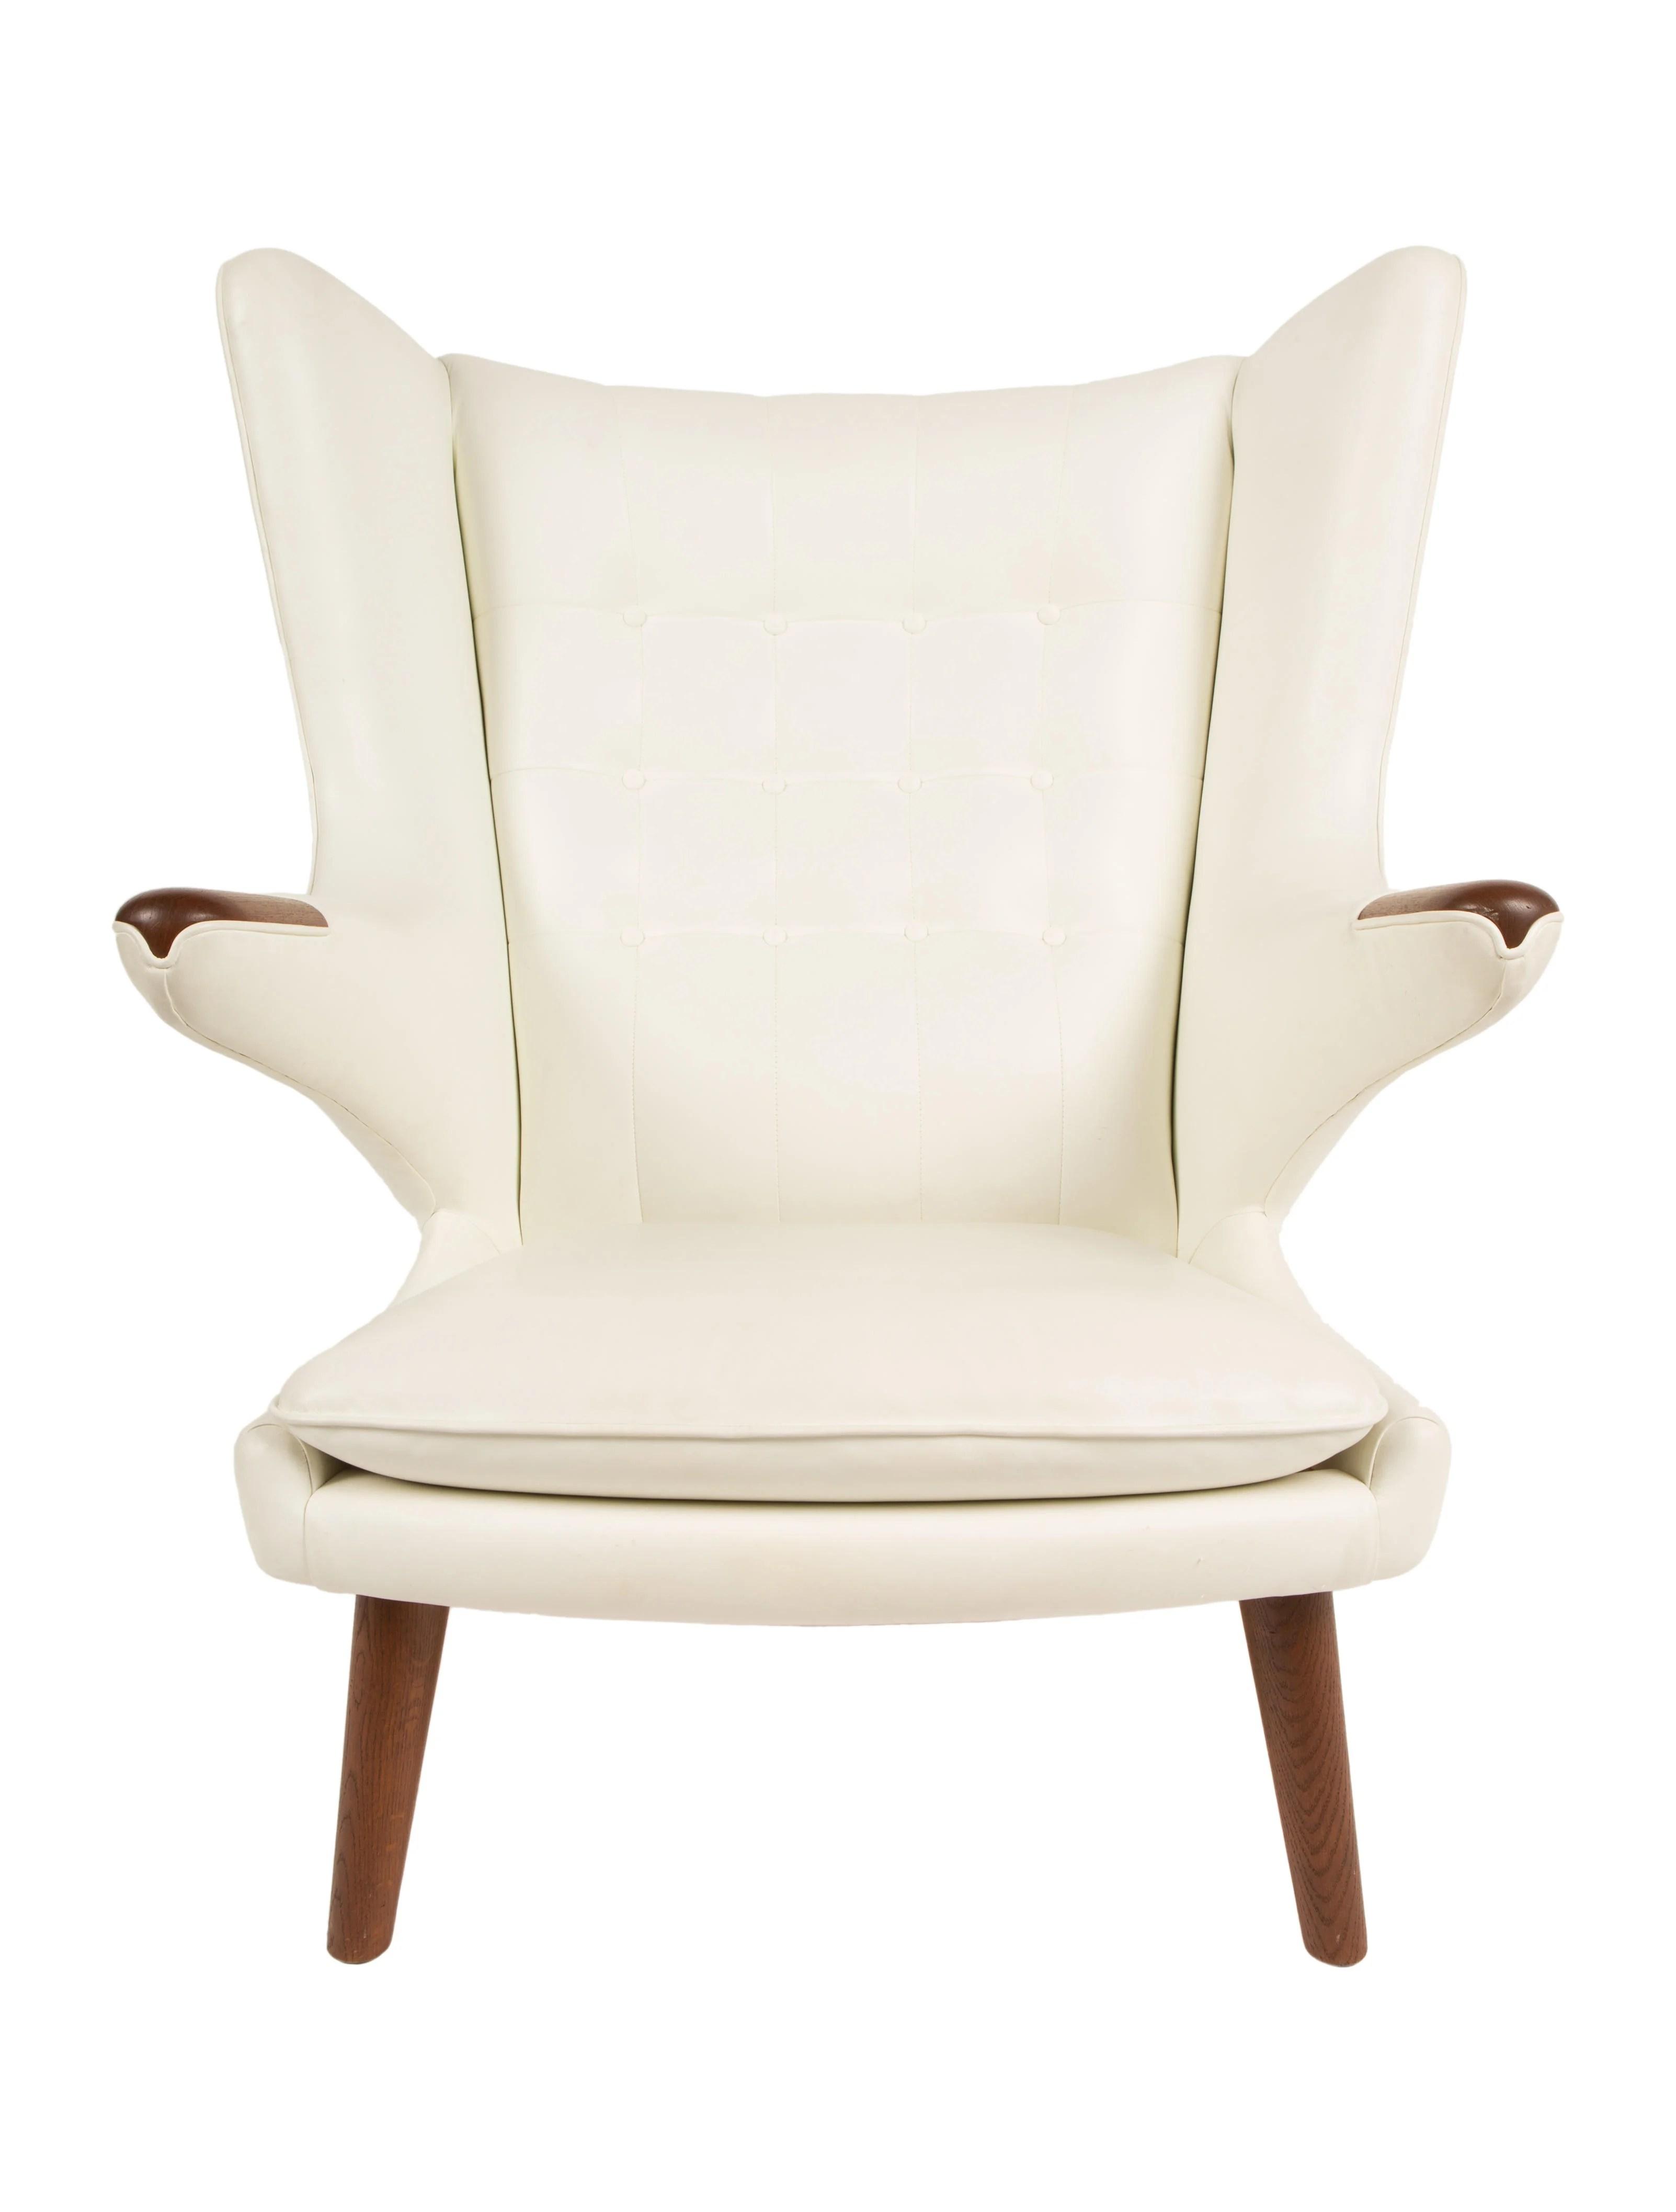 papa bear chair ikea easy hans wegner furniture hwg20001 the